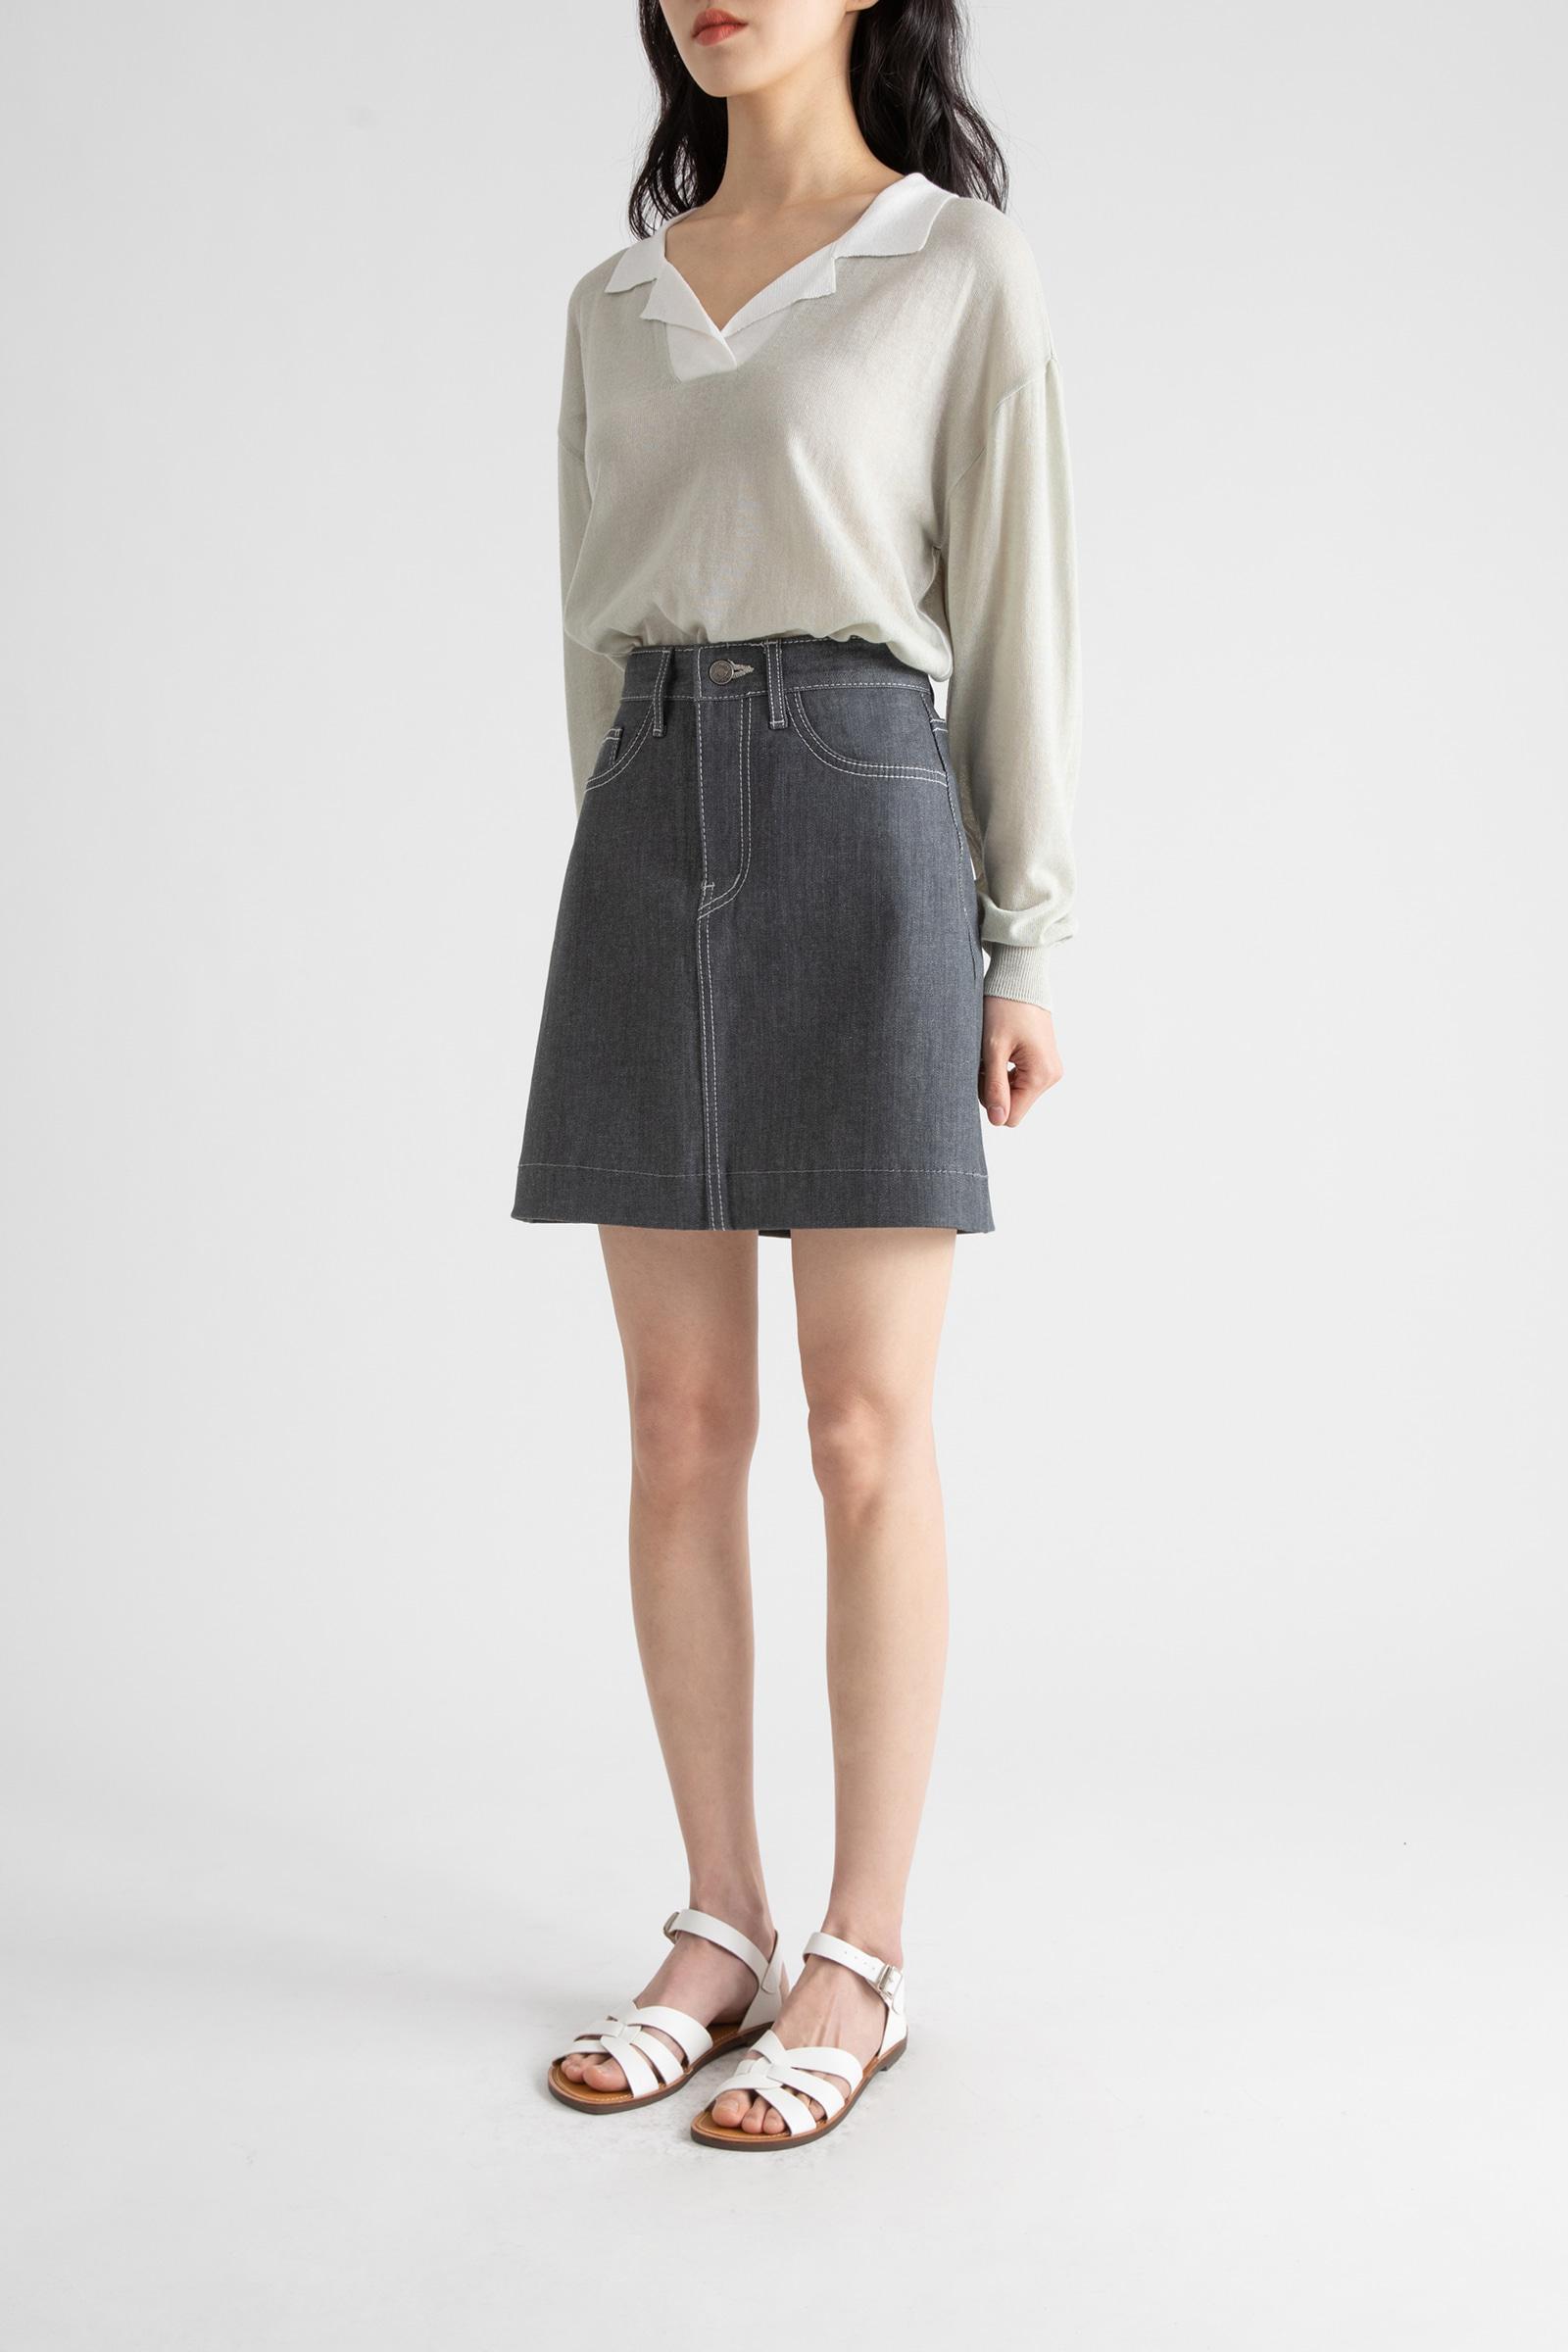 Daily gray denim mini skirt